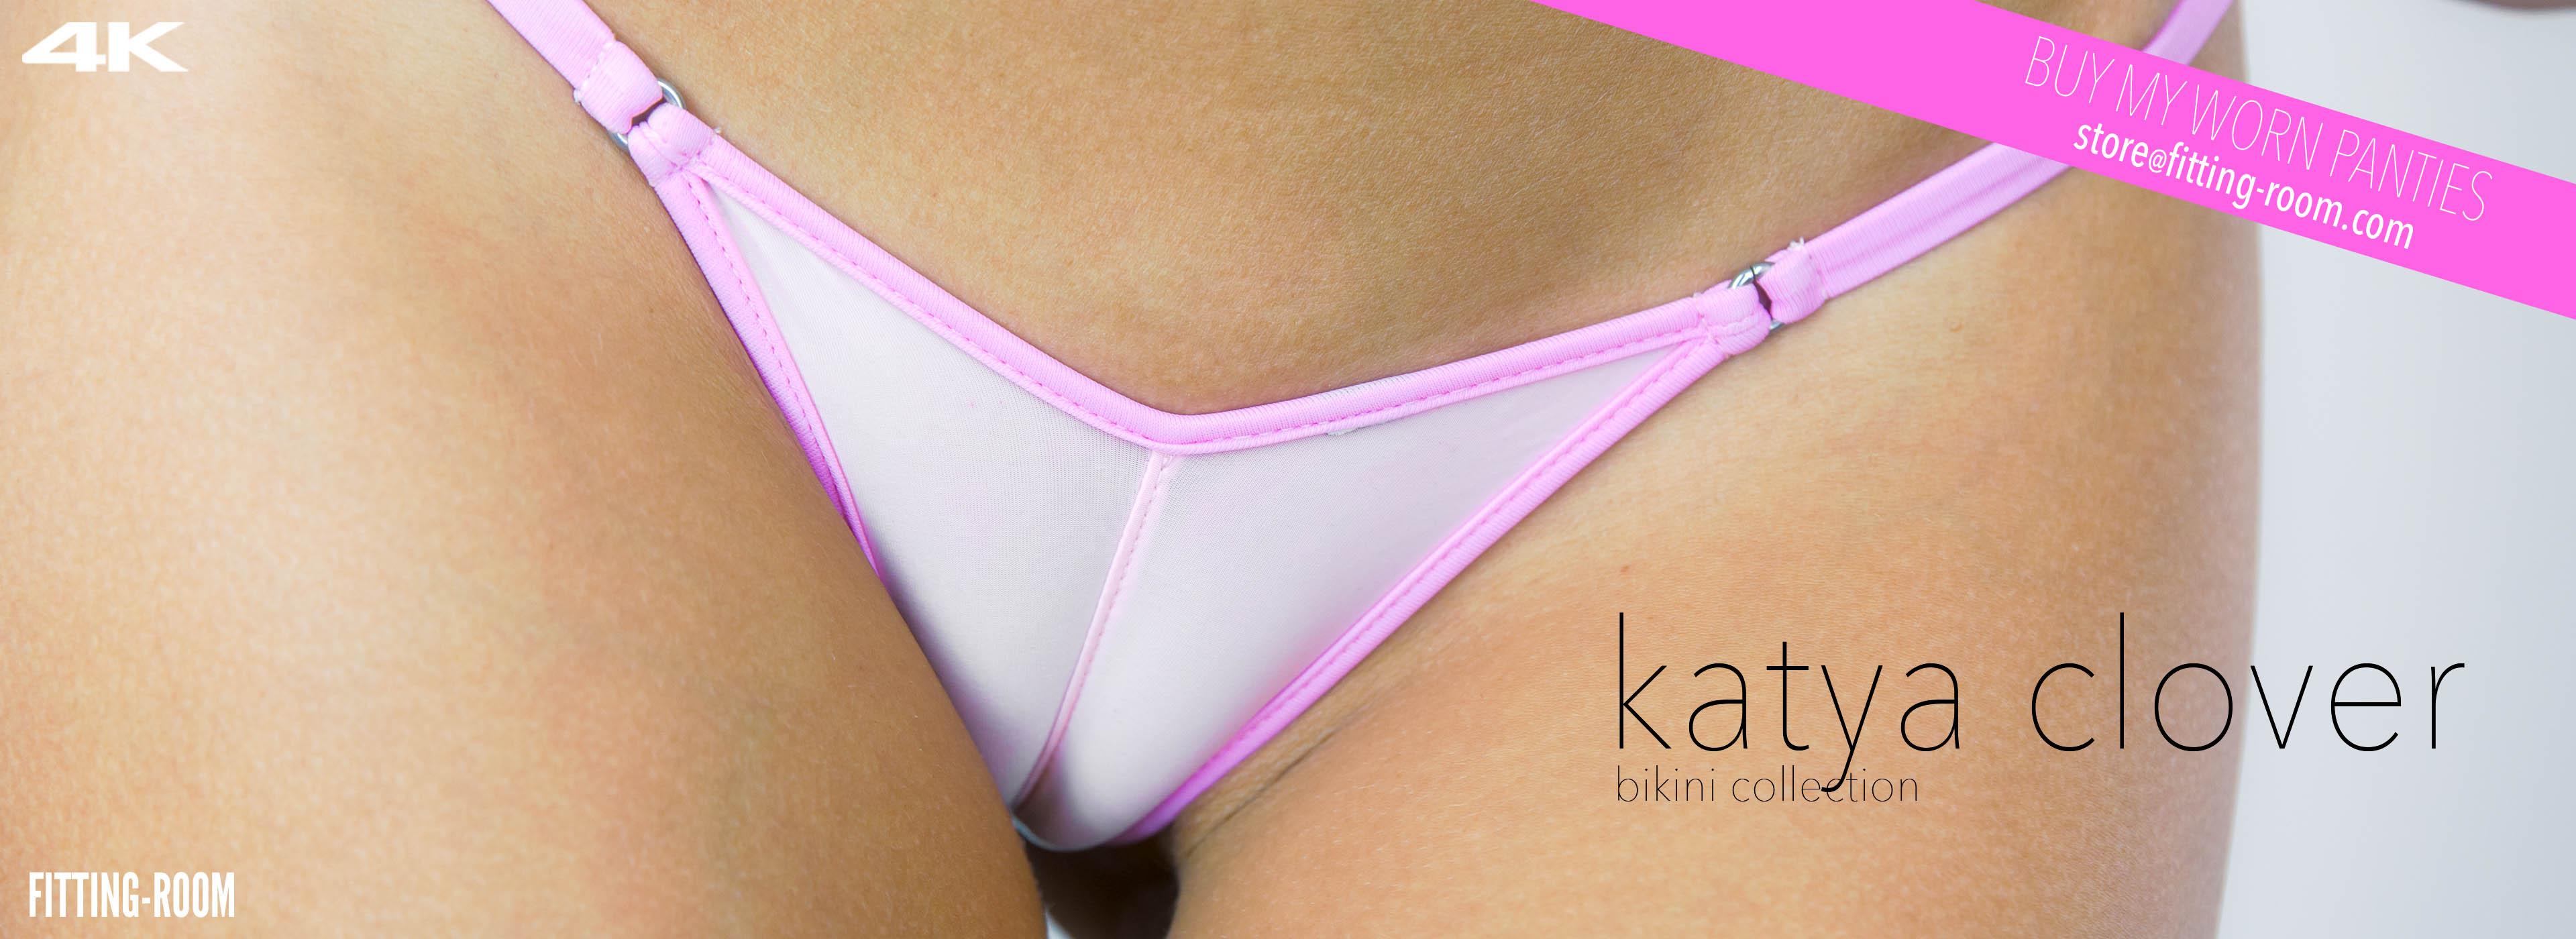 Kayta Clover | Wet Thong Bikini